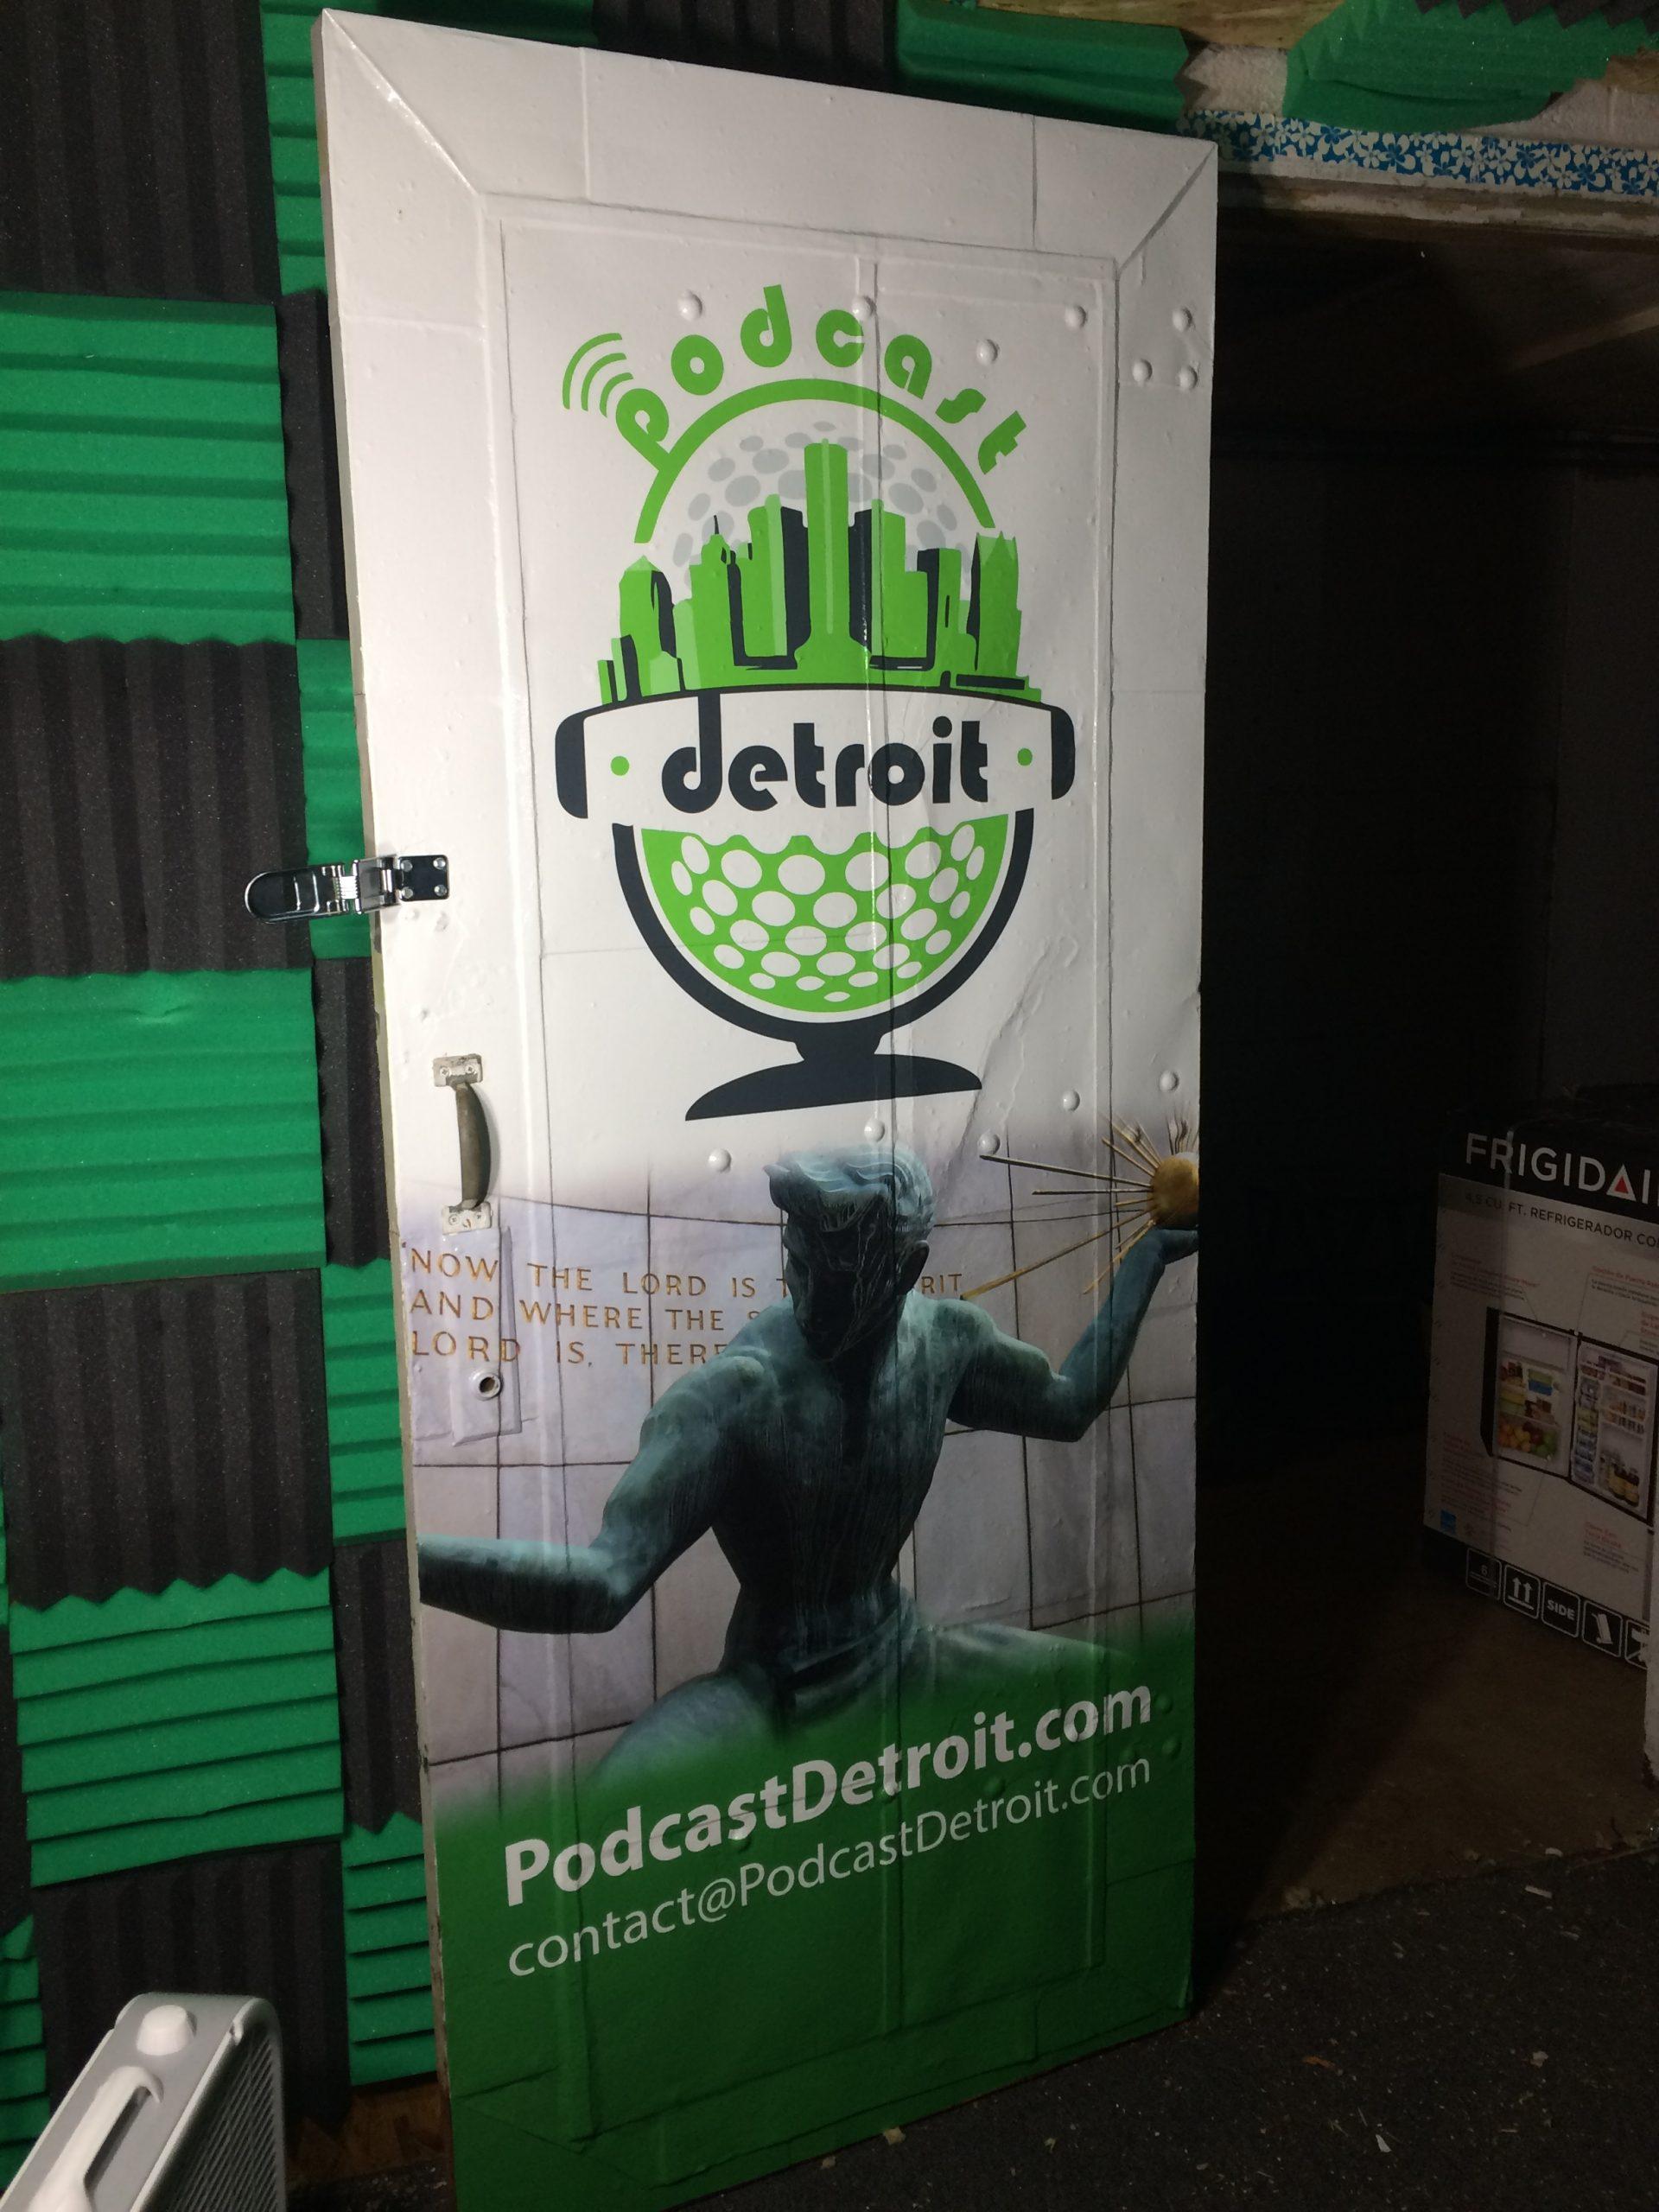 Podcast Detroit Door Wrap - after